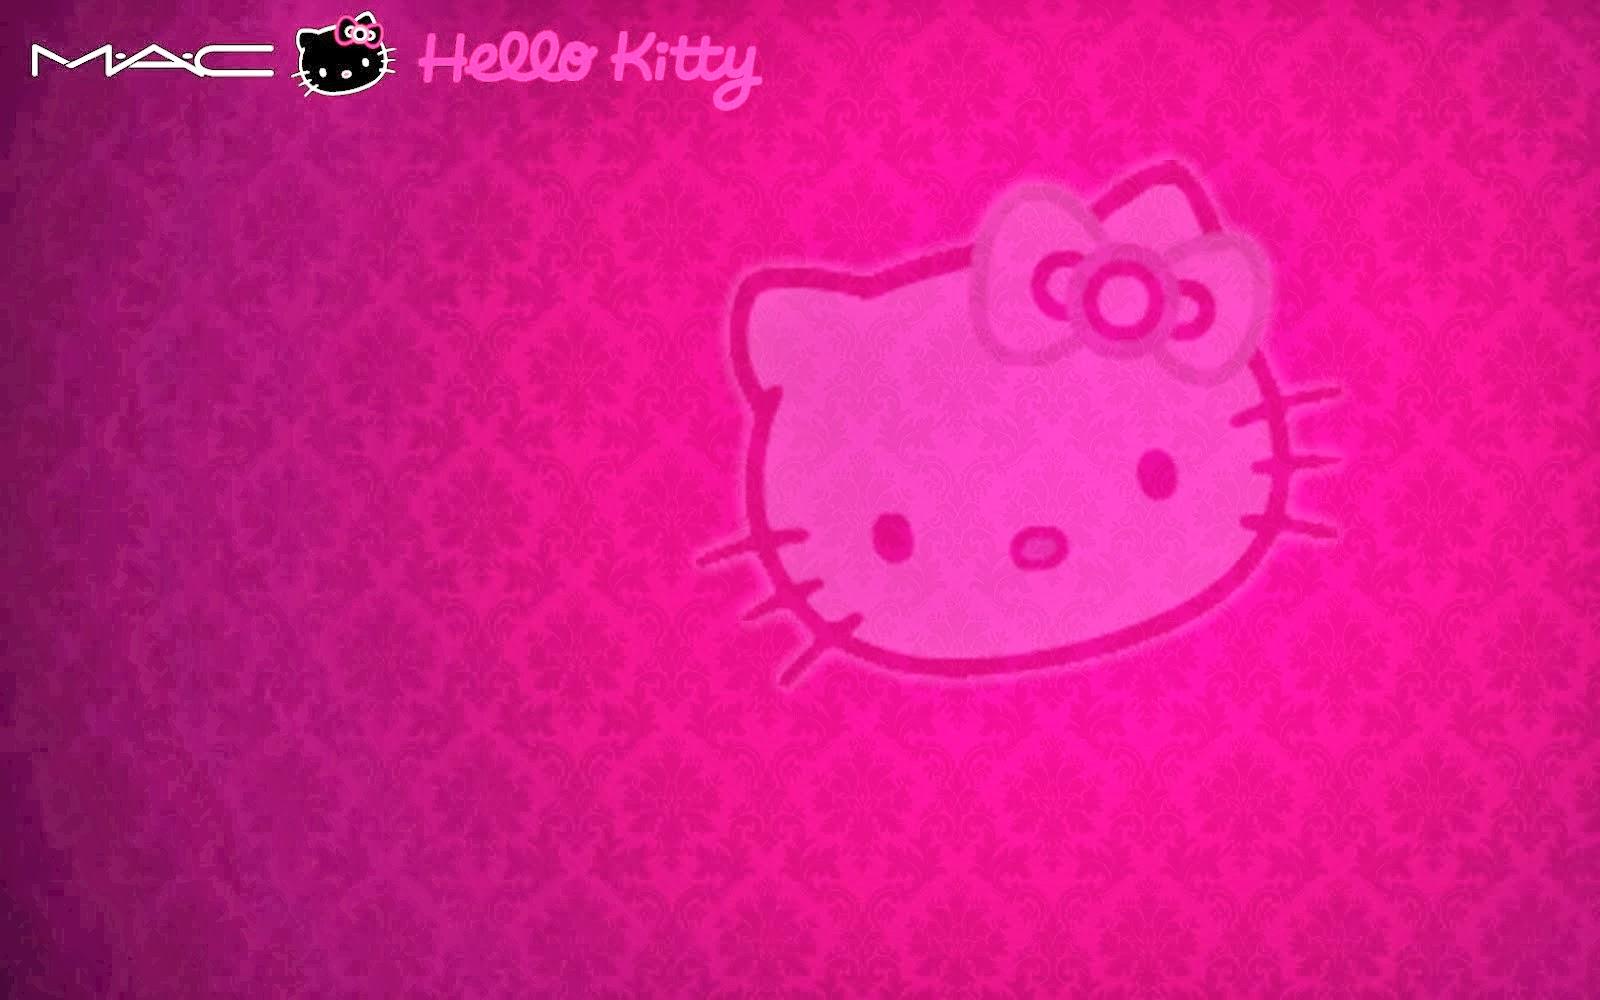 Download Wallpaper Hello Kitty Purple - Hello-kitty-wallpaper-29  Picture_279570.jpg